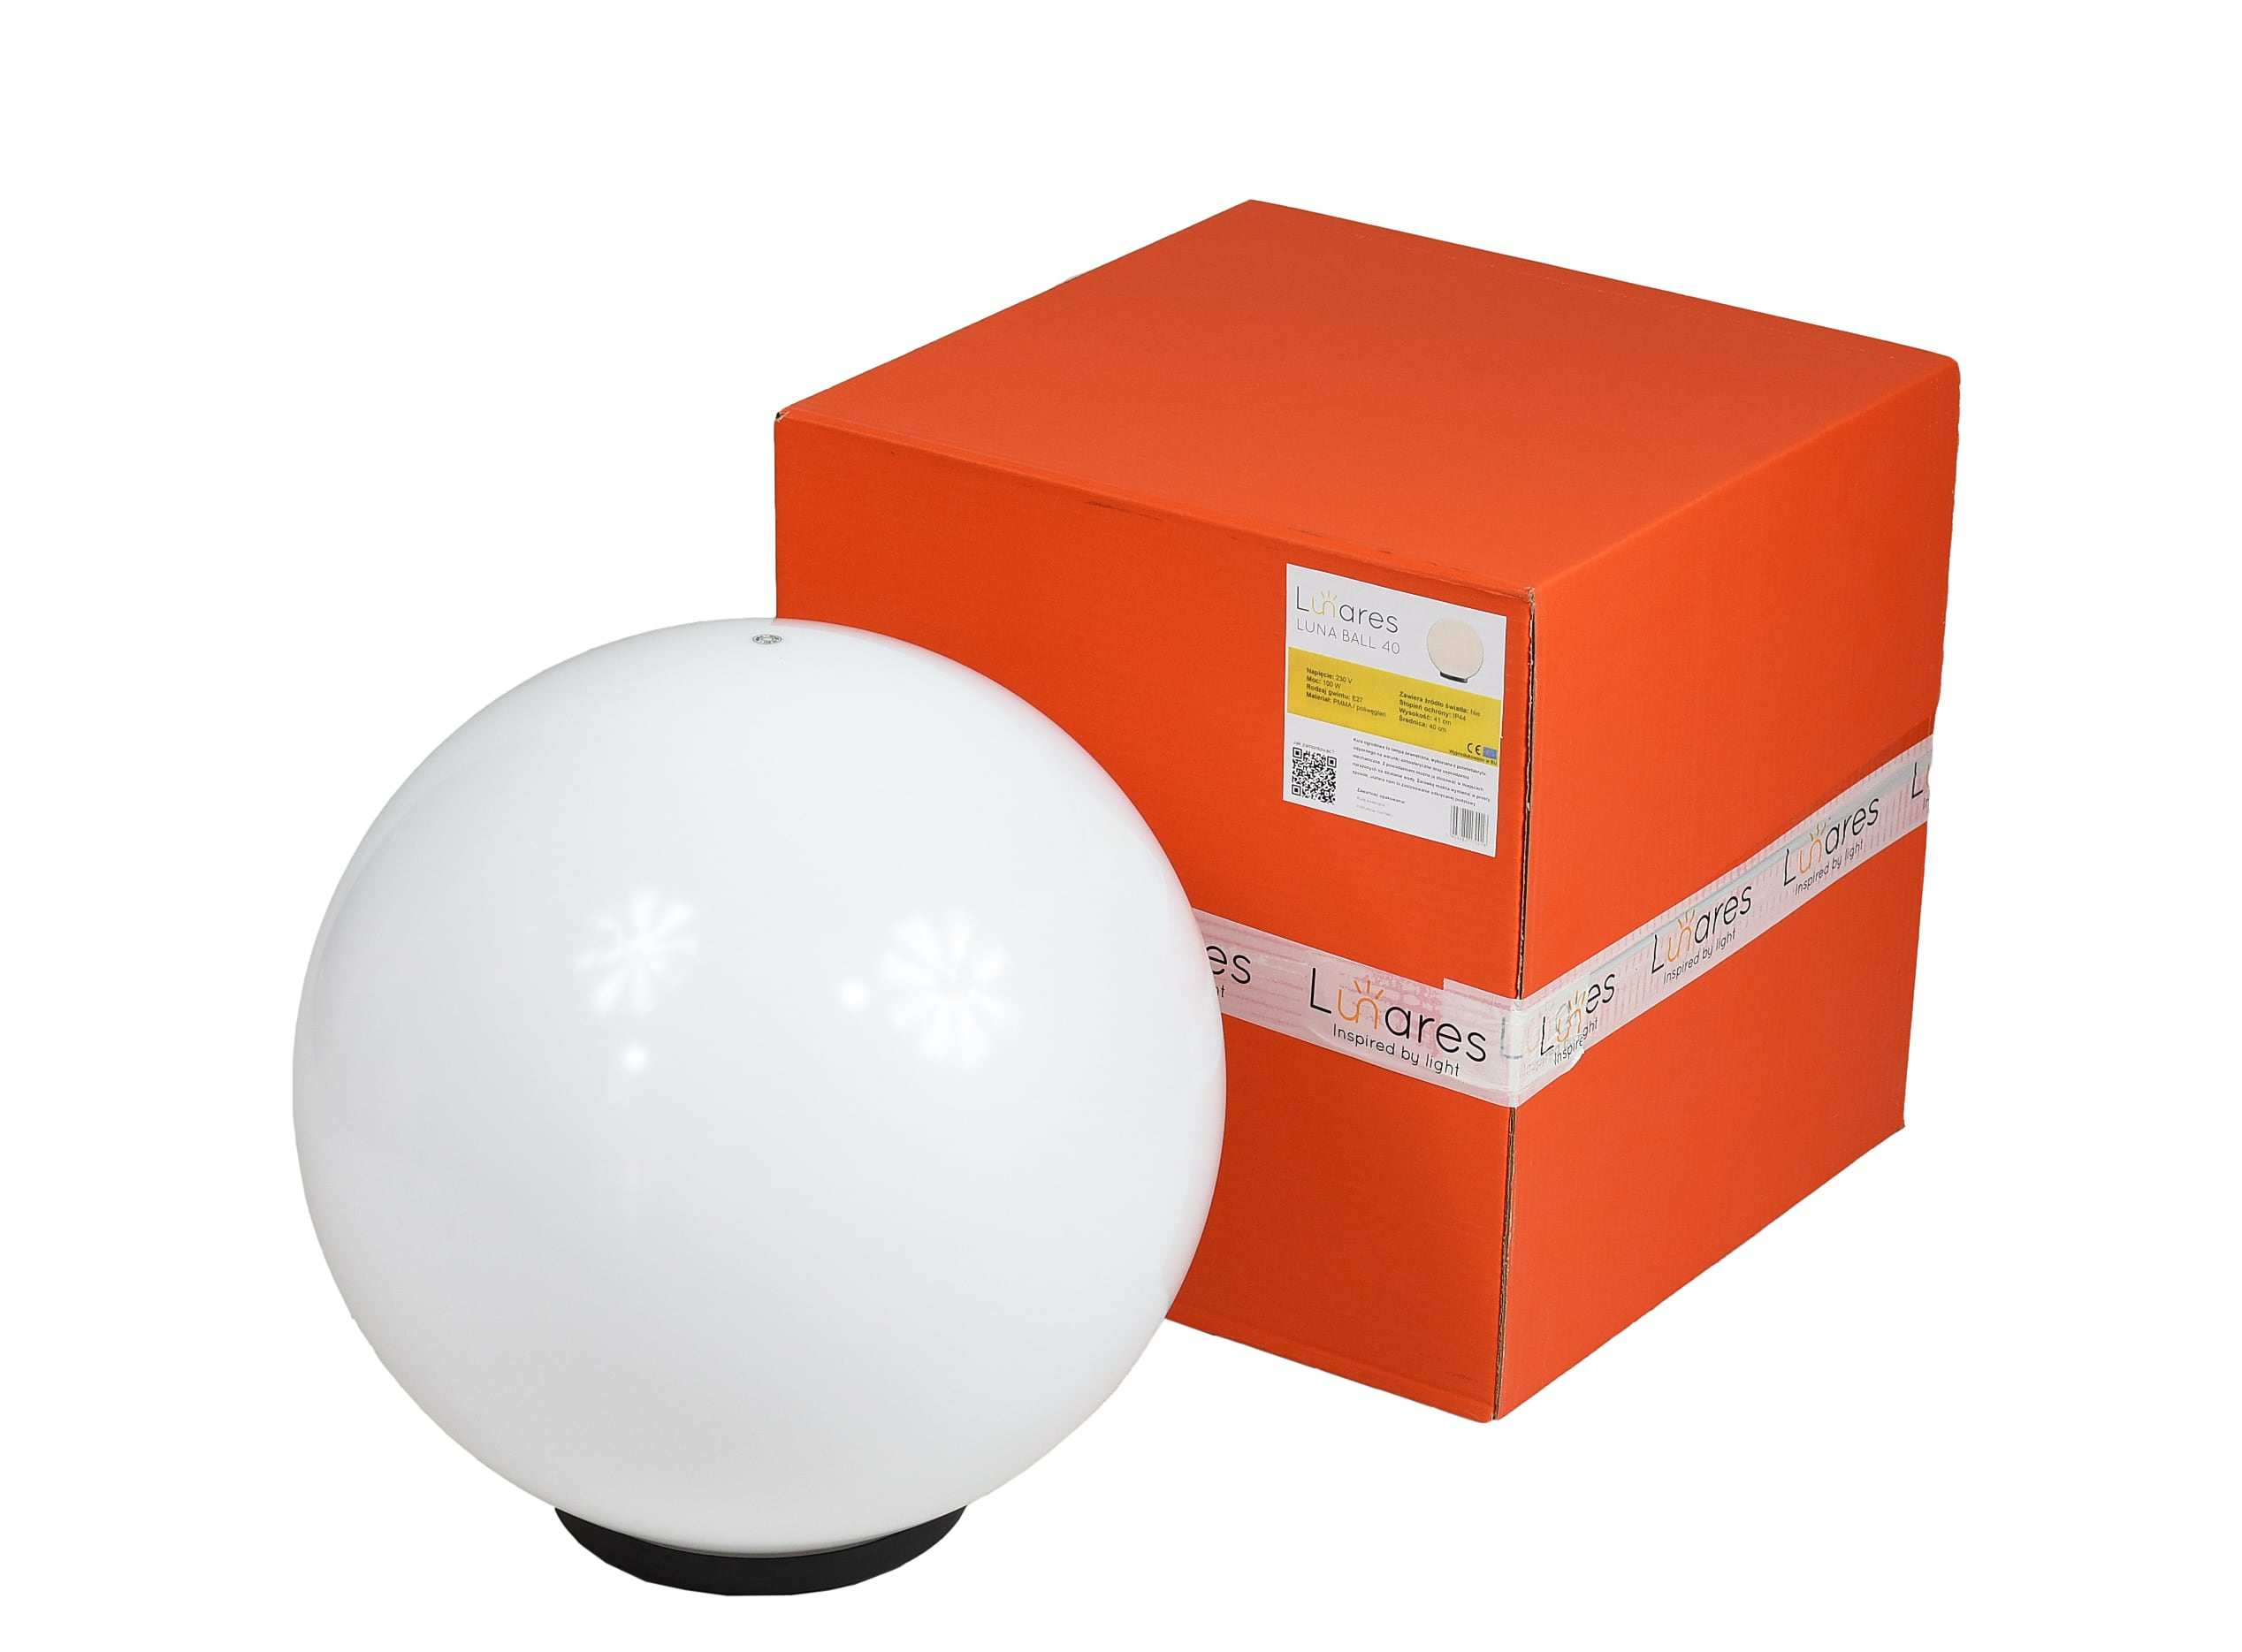 Glowing garden ball, Luna ball 40 cm, path lighting, white, gloss